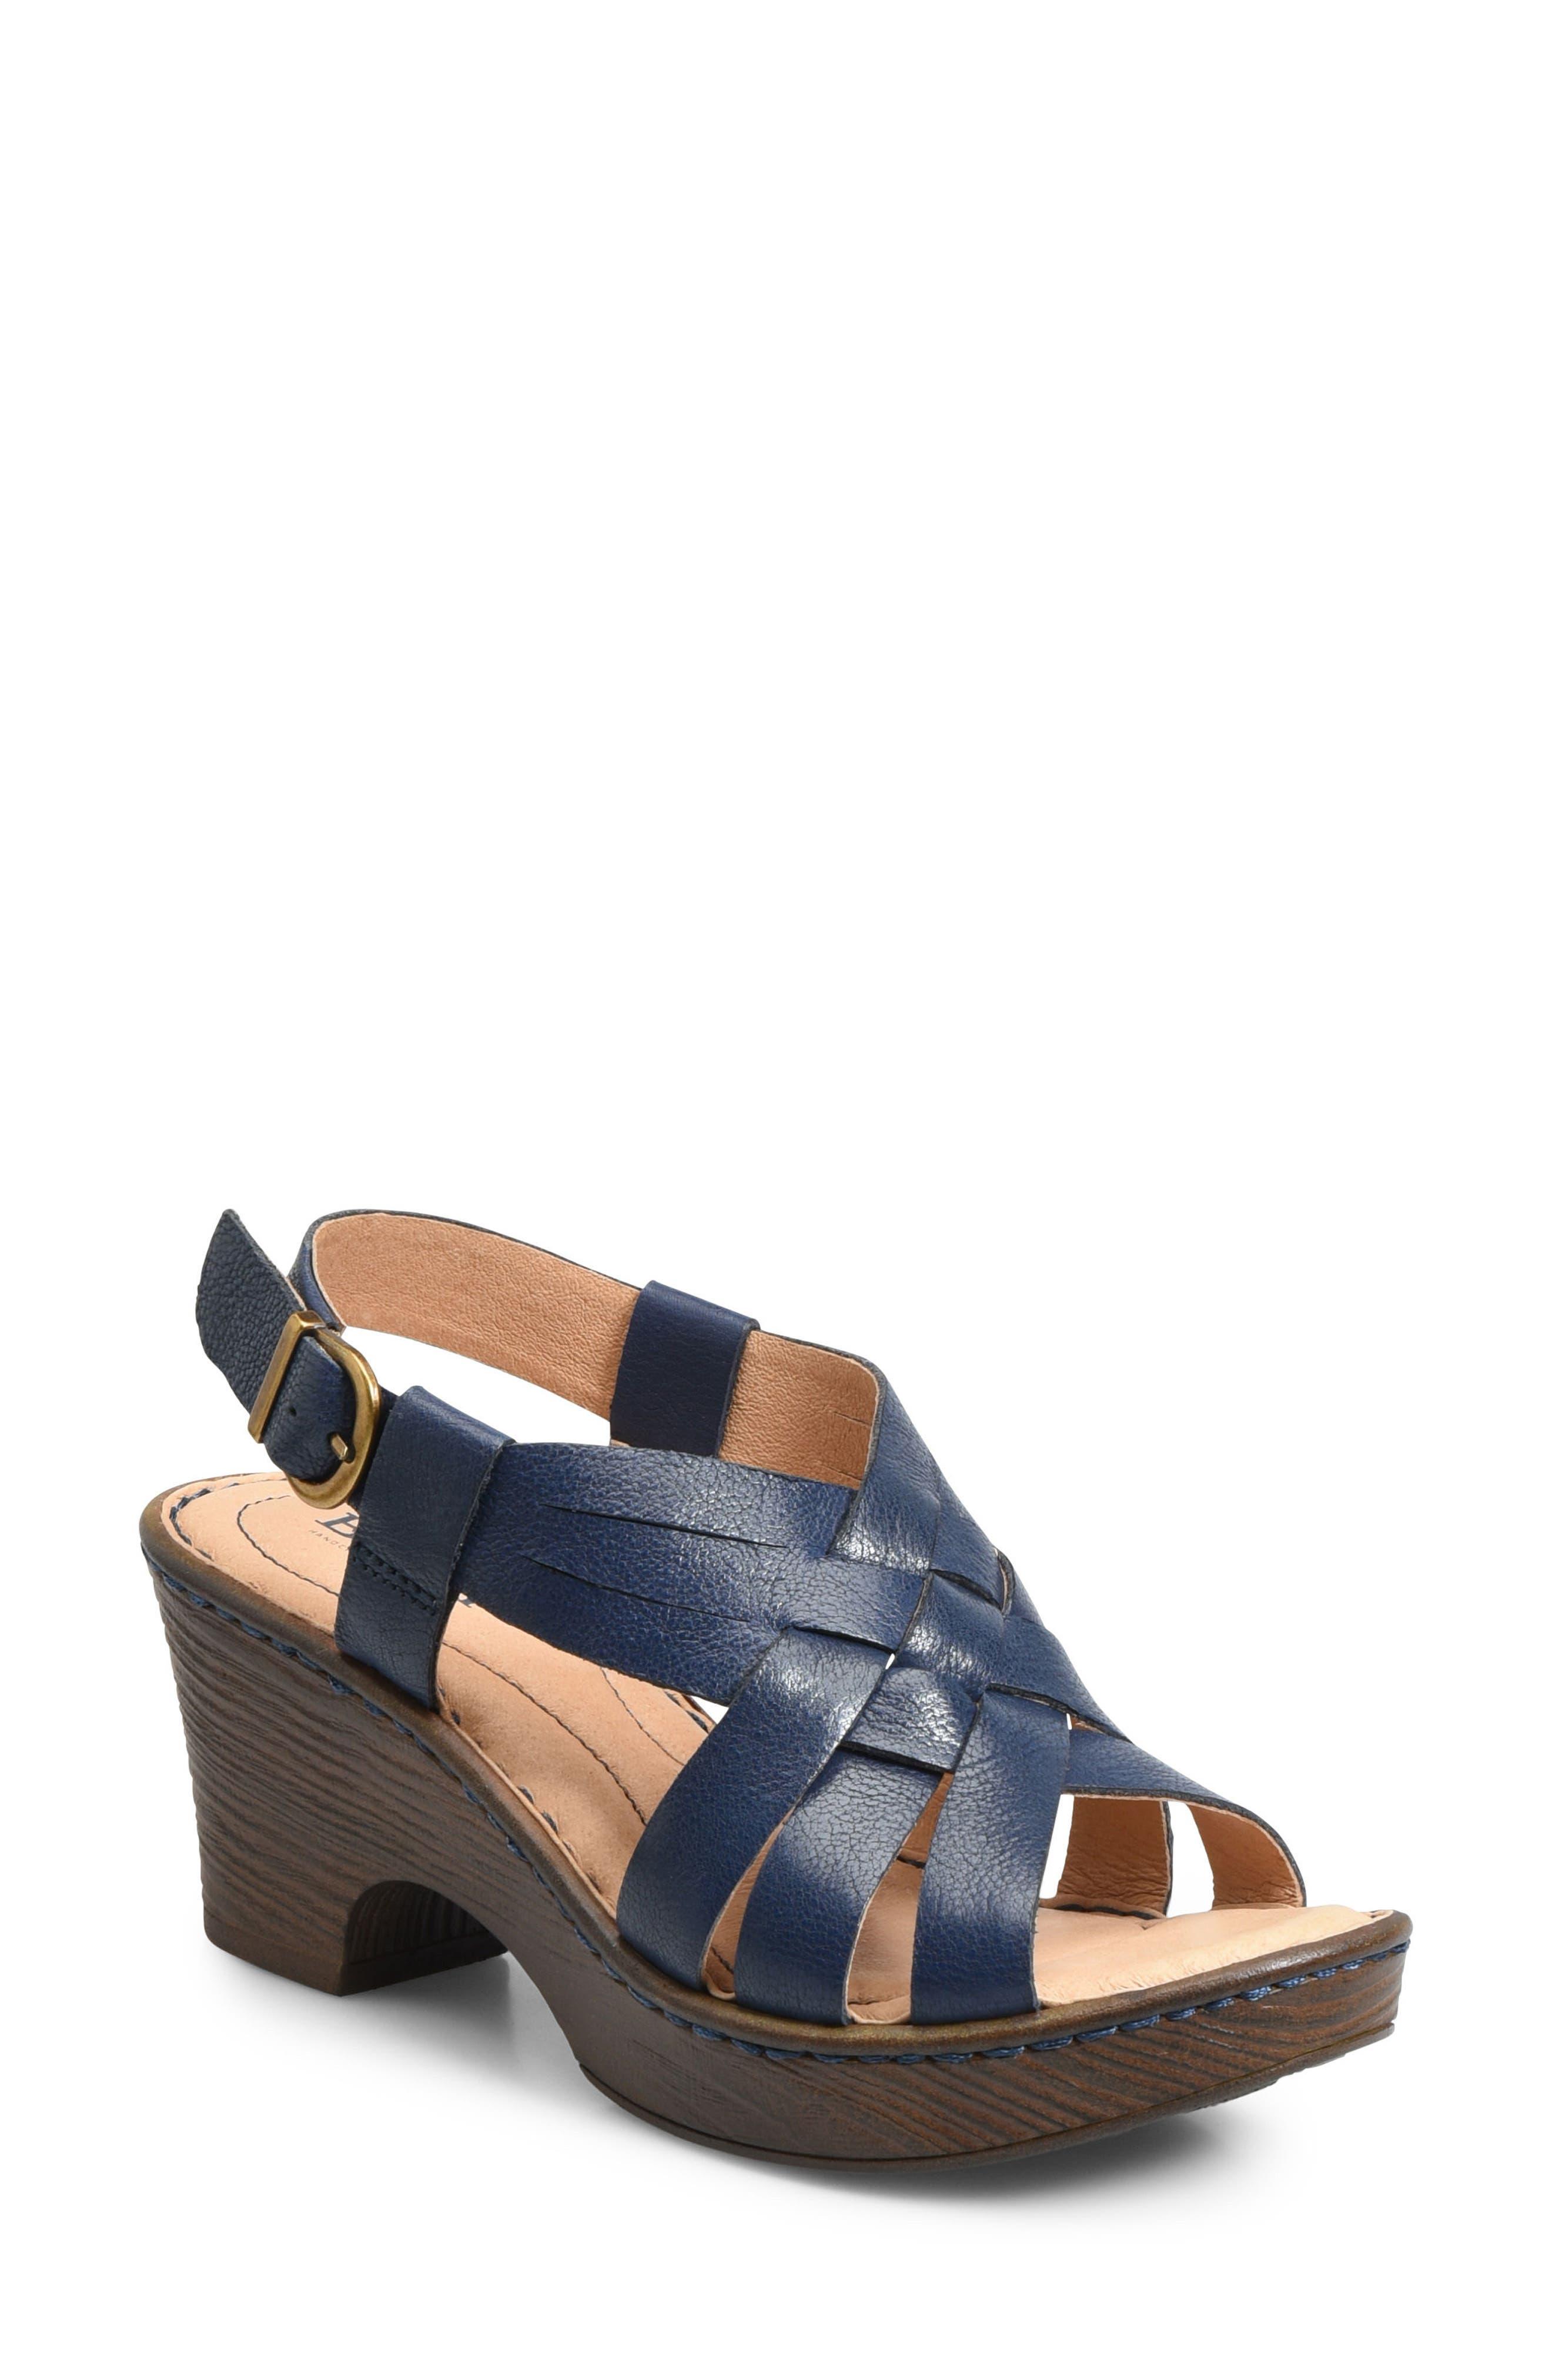 Crevalle Platform Sandal,                             Main thumbnail 1, color,                             Navy Leather